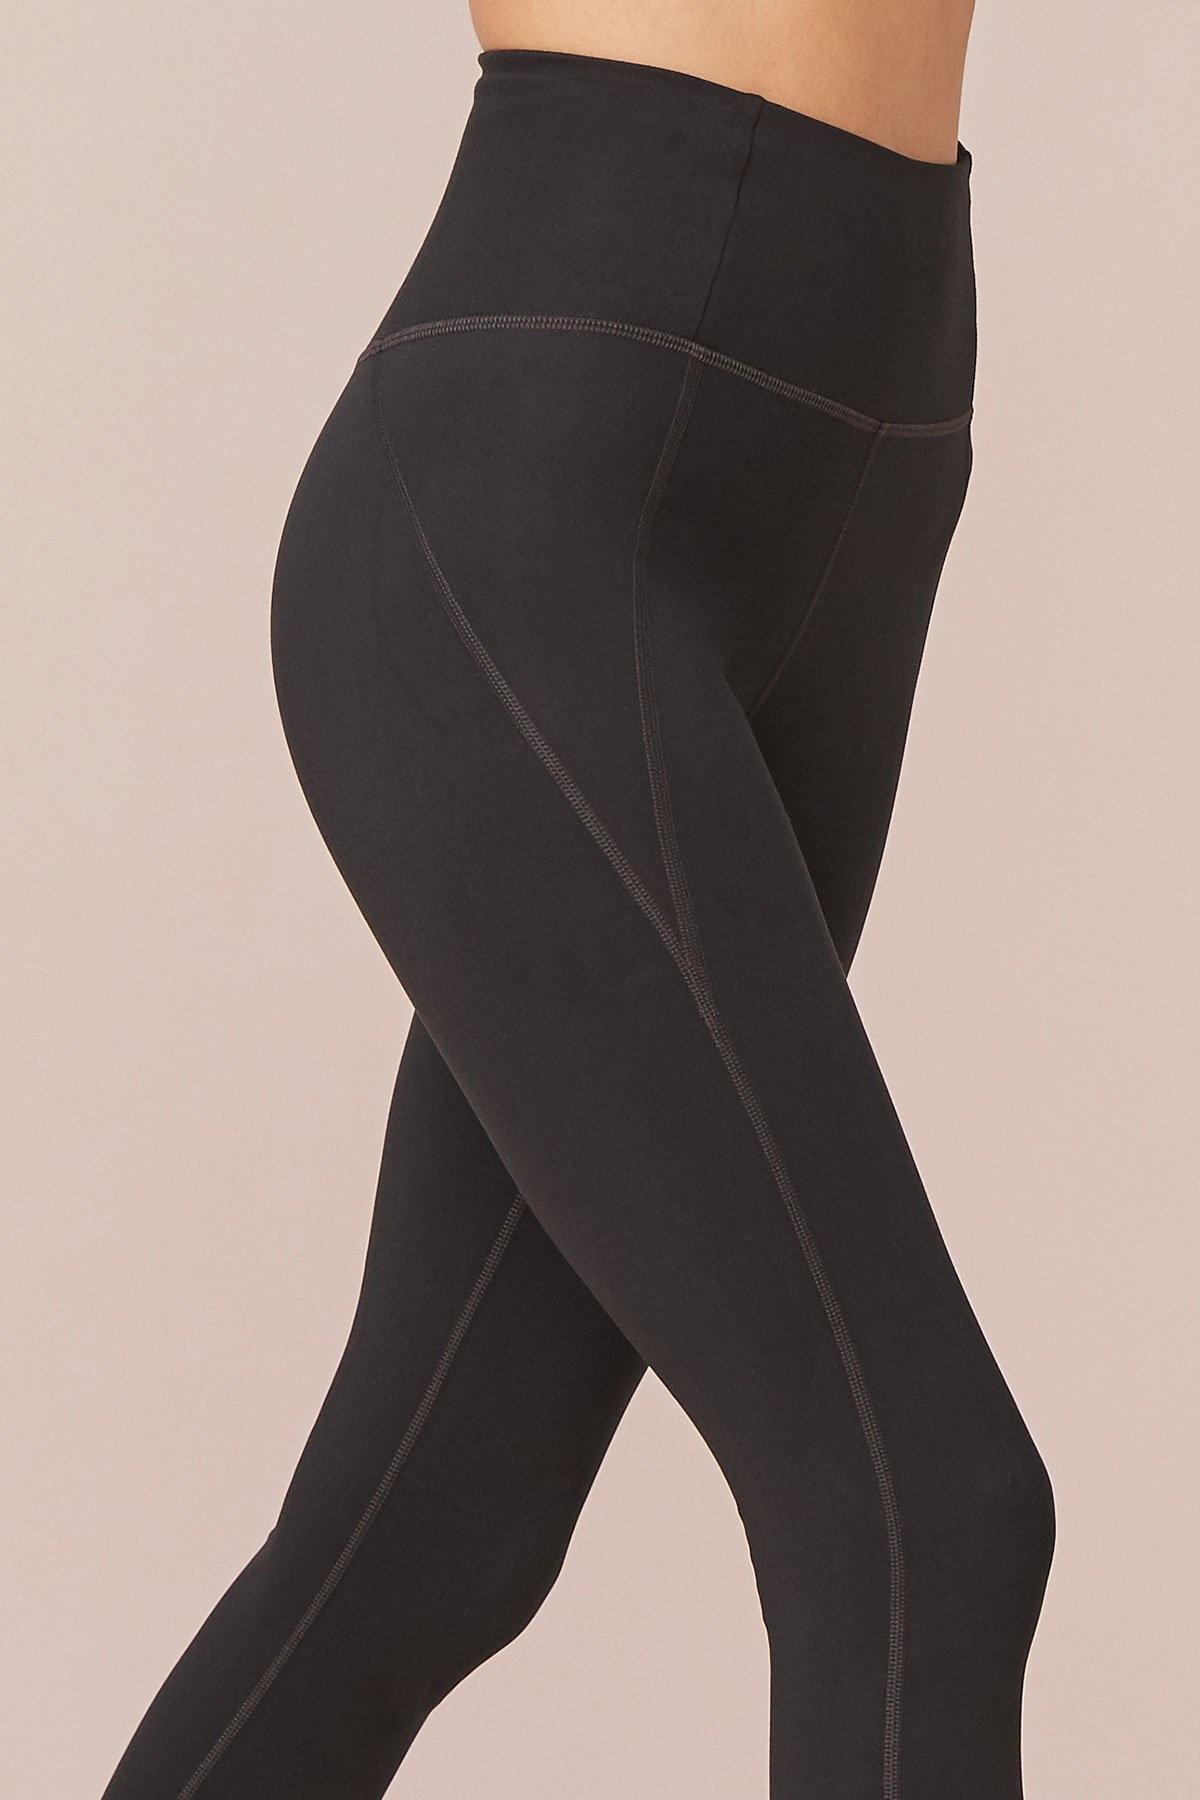 Girlfriend Collective   Compressive high-rise legging zwart-5